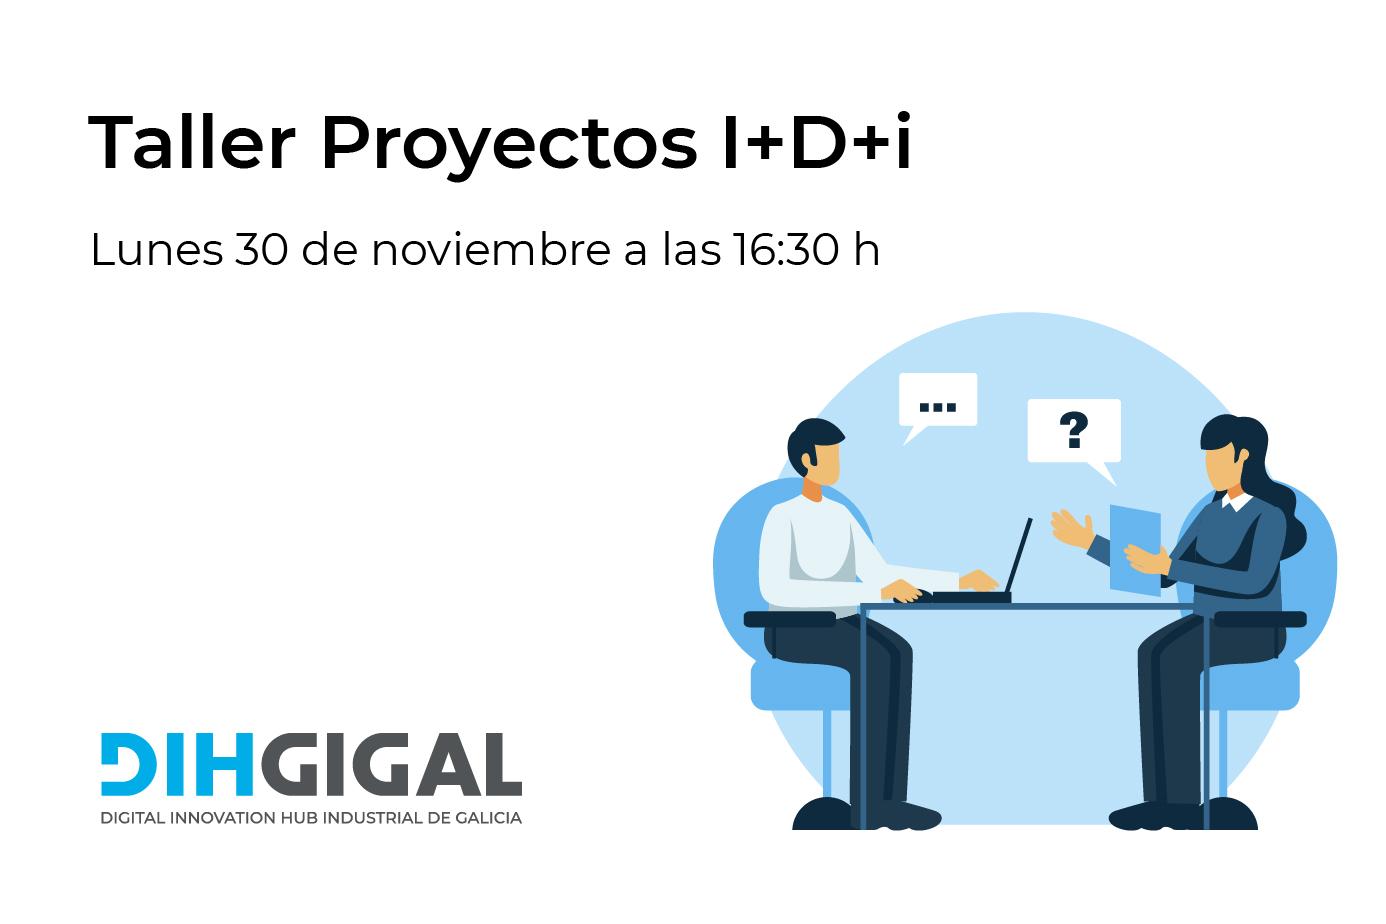 TALLER PROYECTOS I+D+I WEB_Tamaño noticia web copia